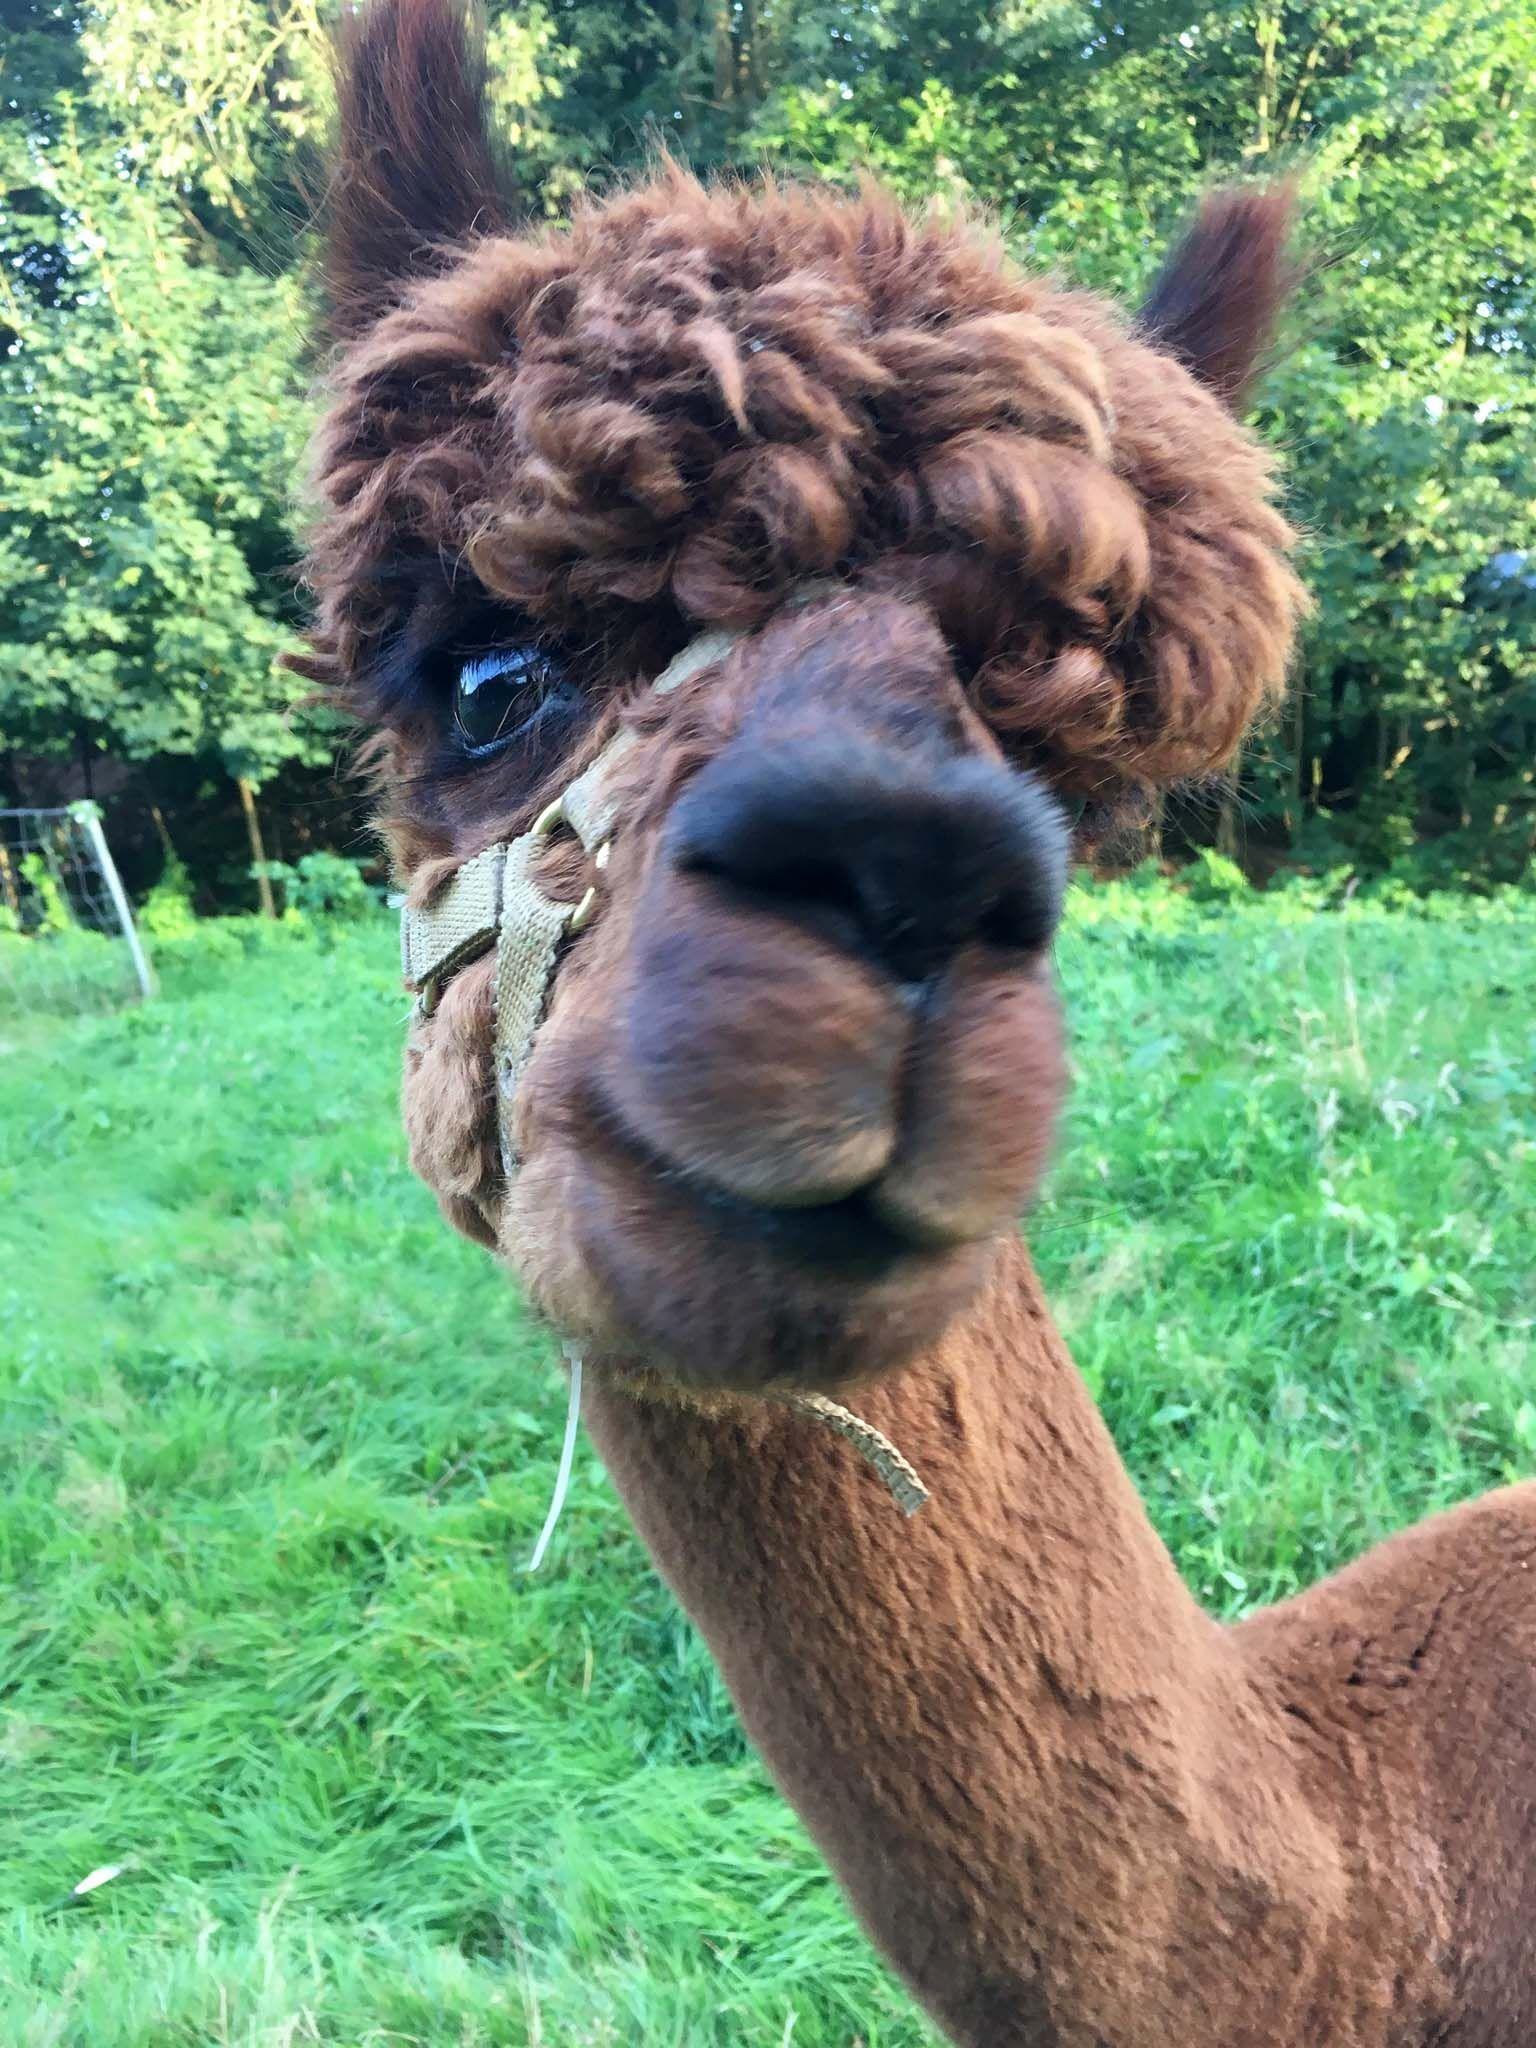 Gute Laune Alpaka Witzige Tierfotos Lustige Tiere Funny Animals